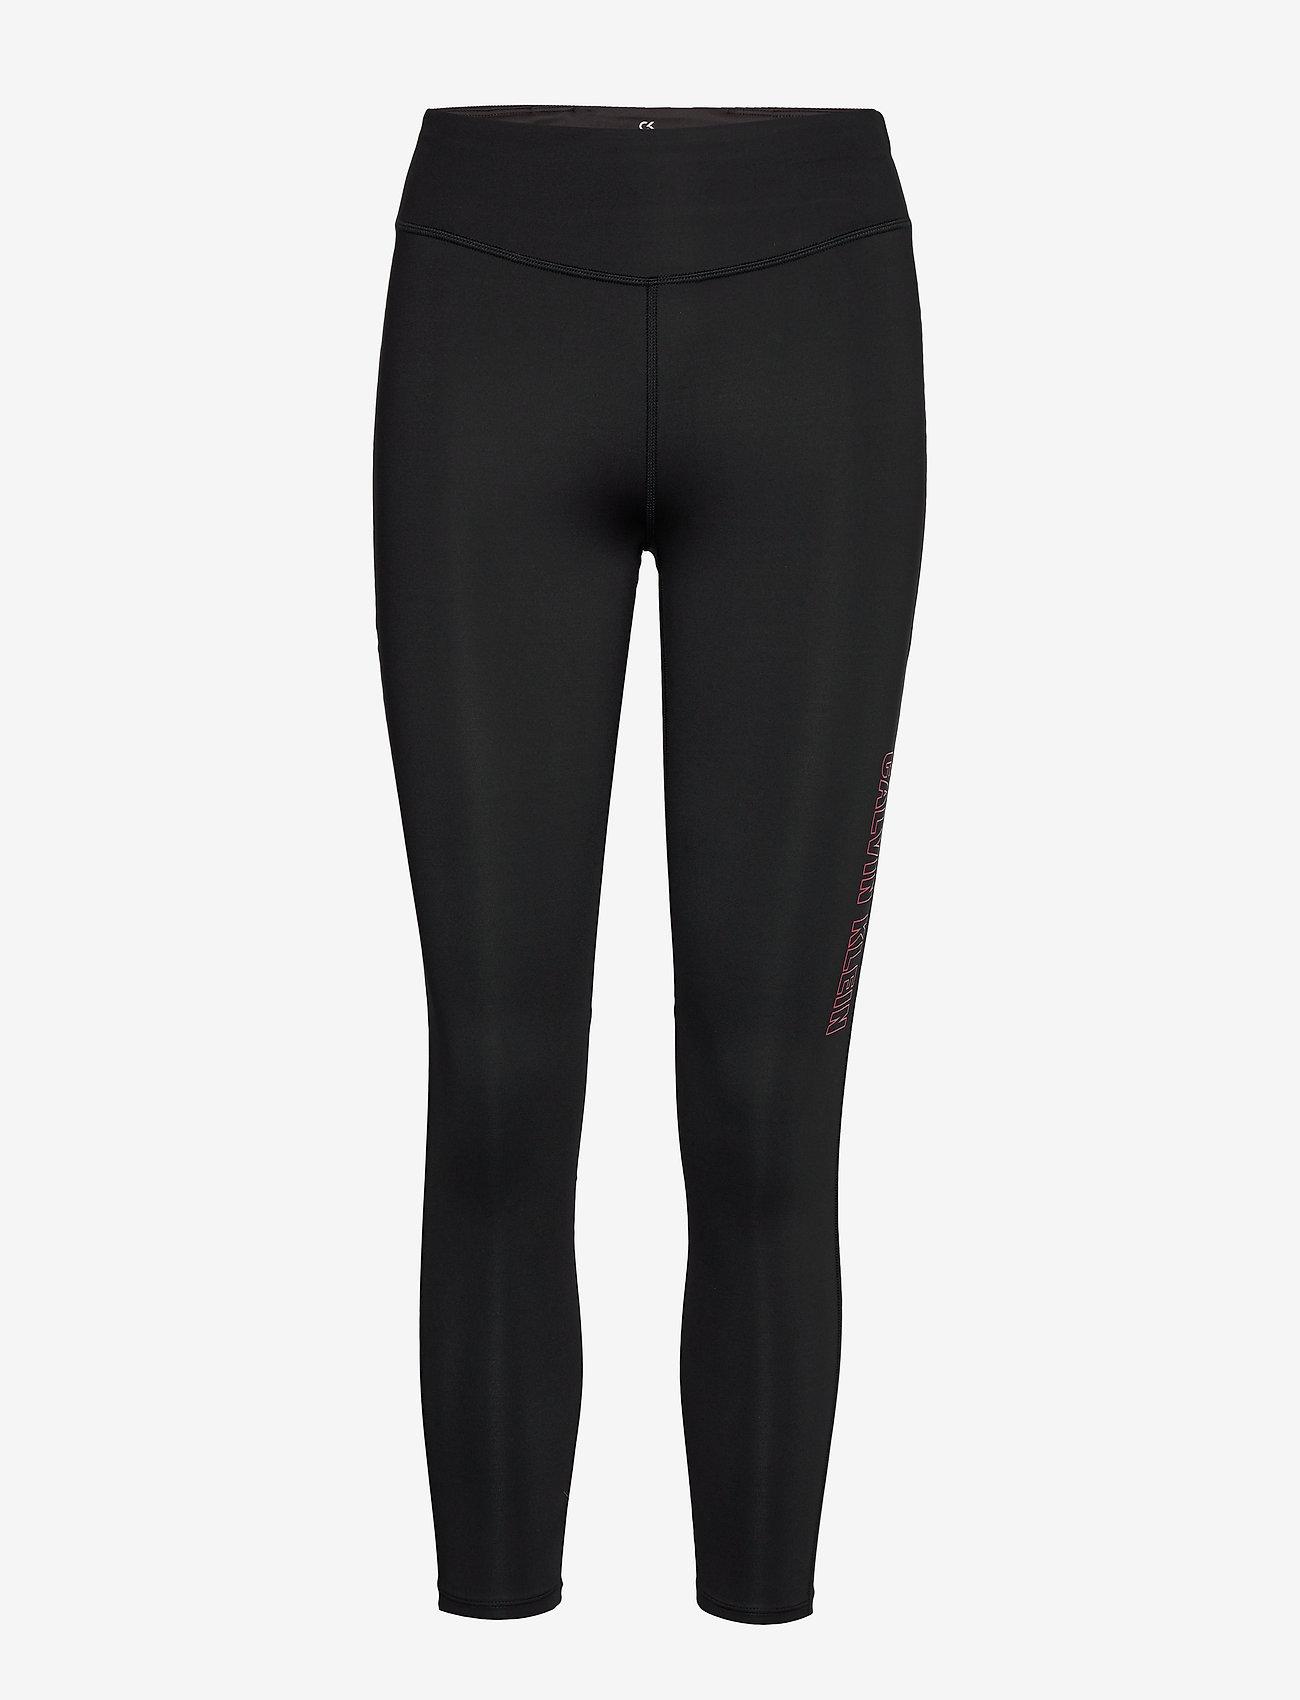 Calvin Klein Performance - 7/8 TIGHT - running & training tights - ck black - 0